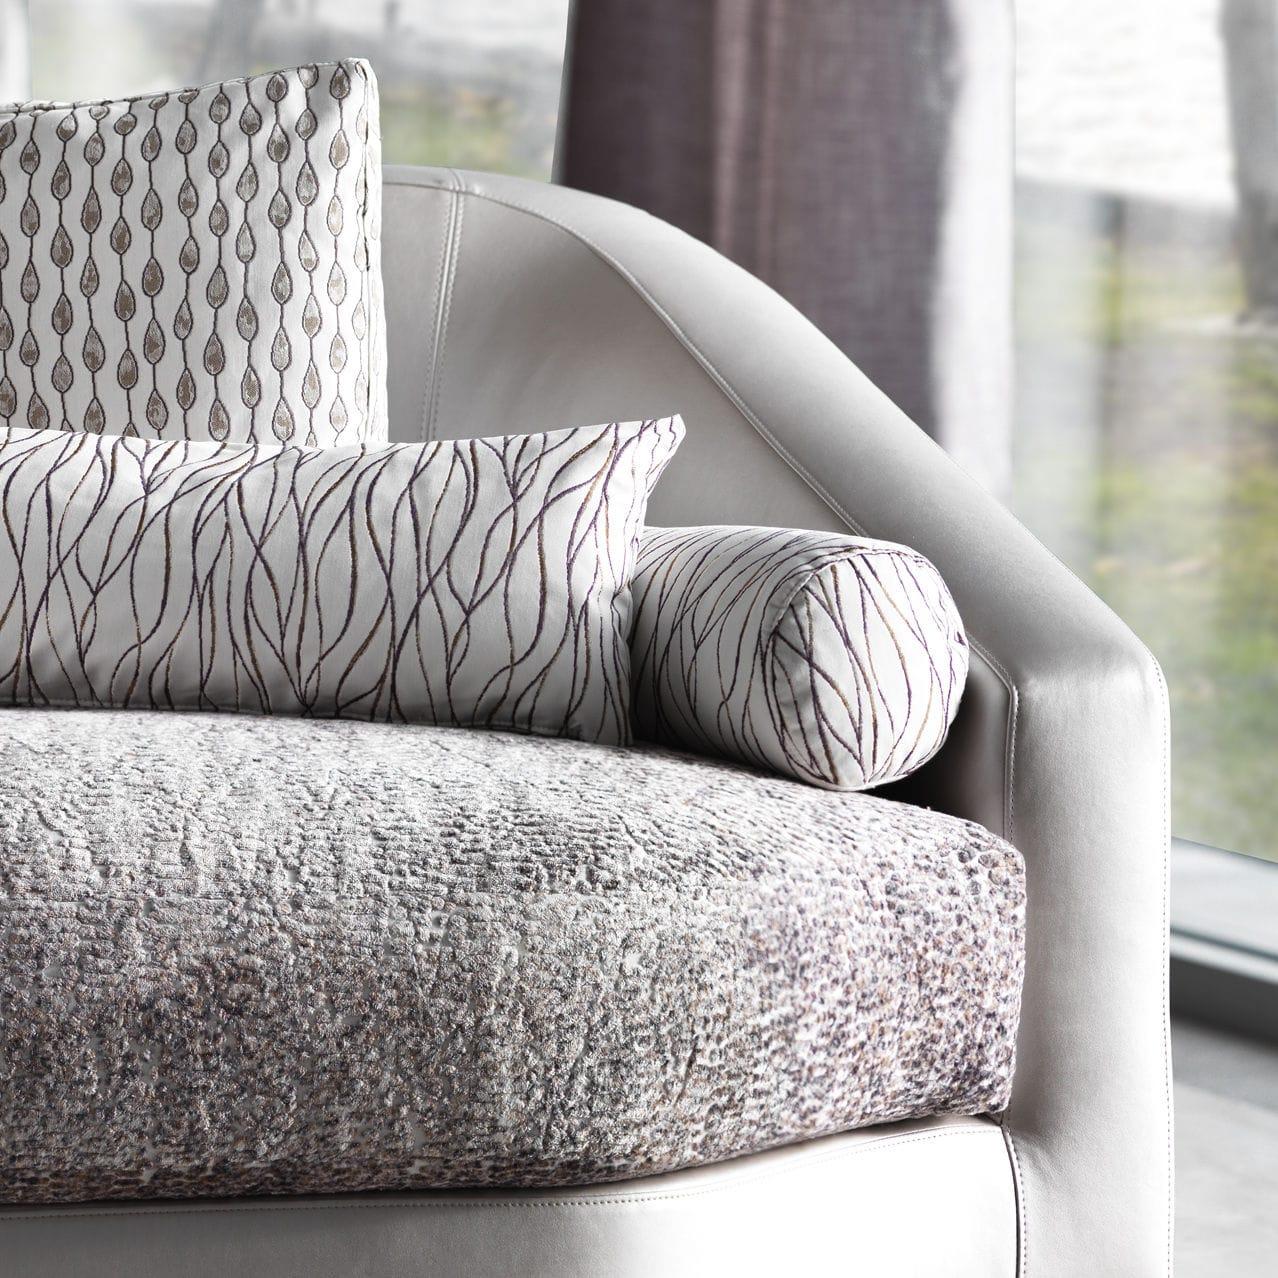 Möbelstoff / für Gardinen / Motiv / Polyester   OLIMPIA: MEDUSA